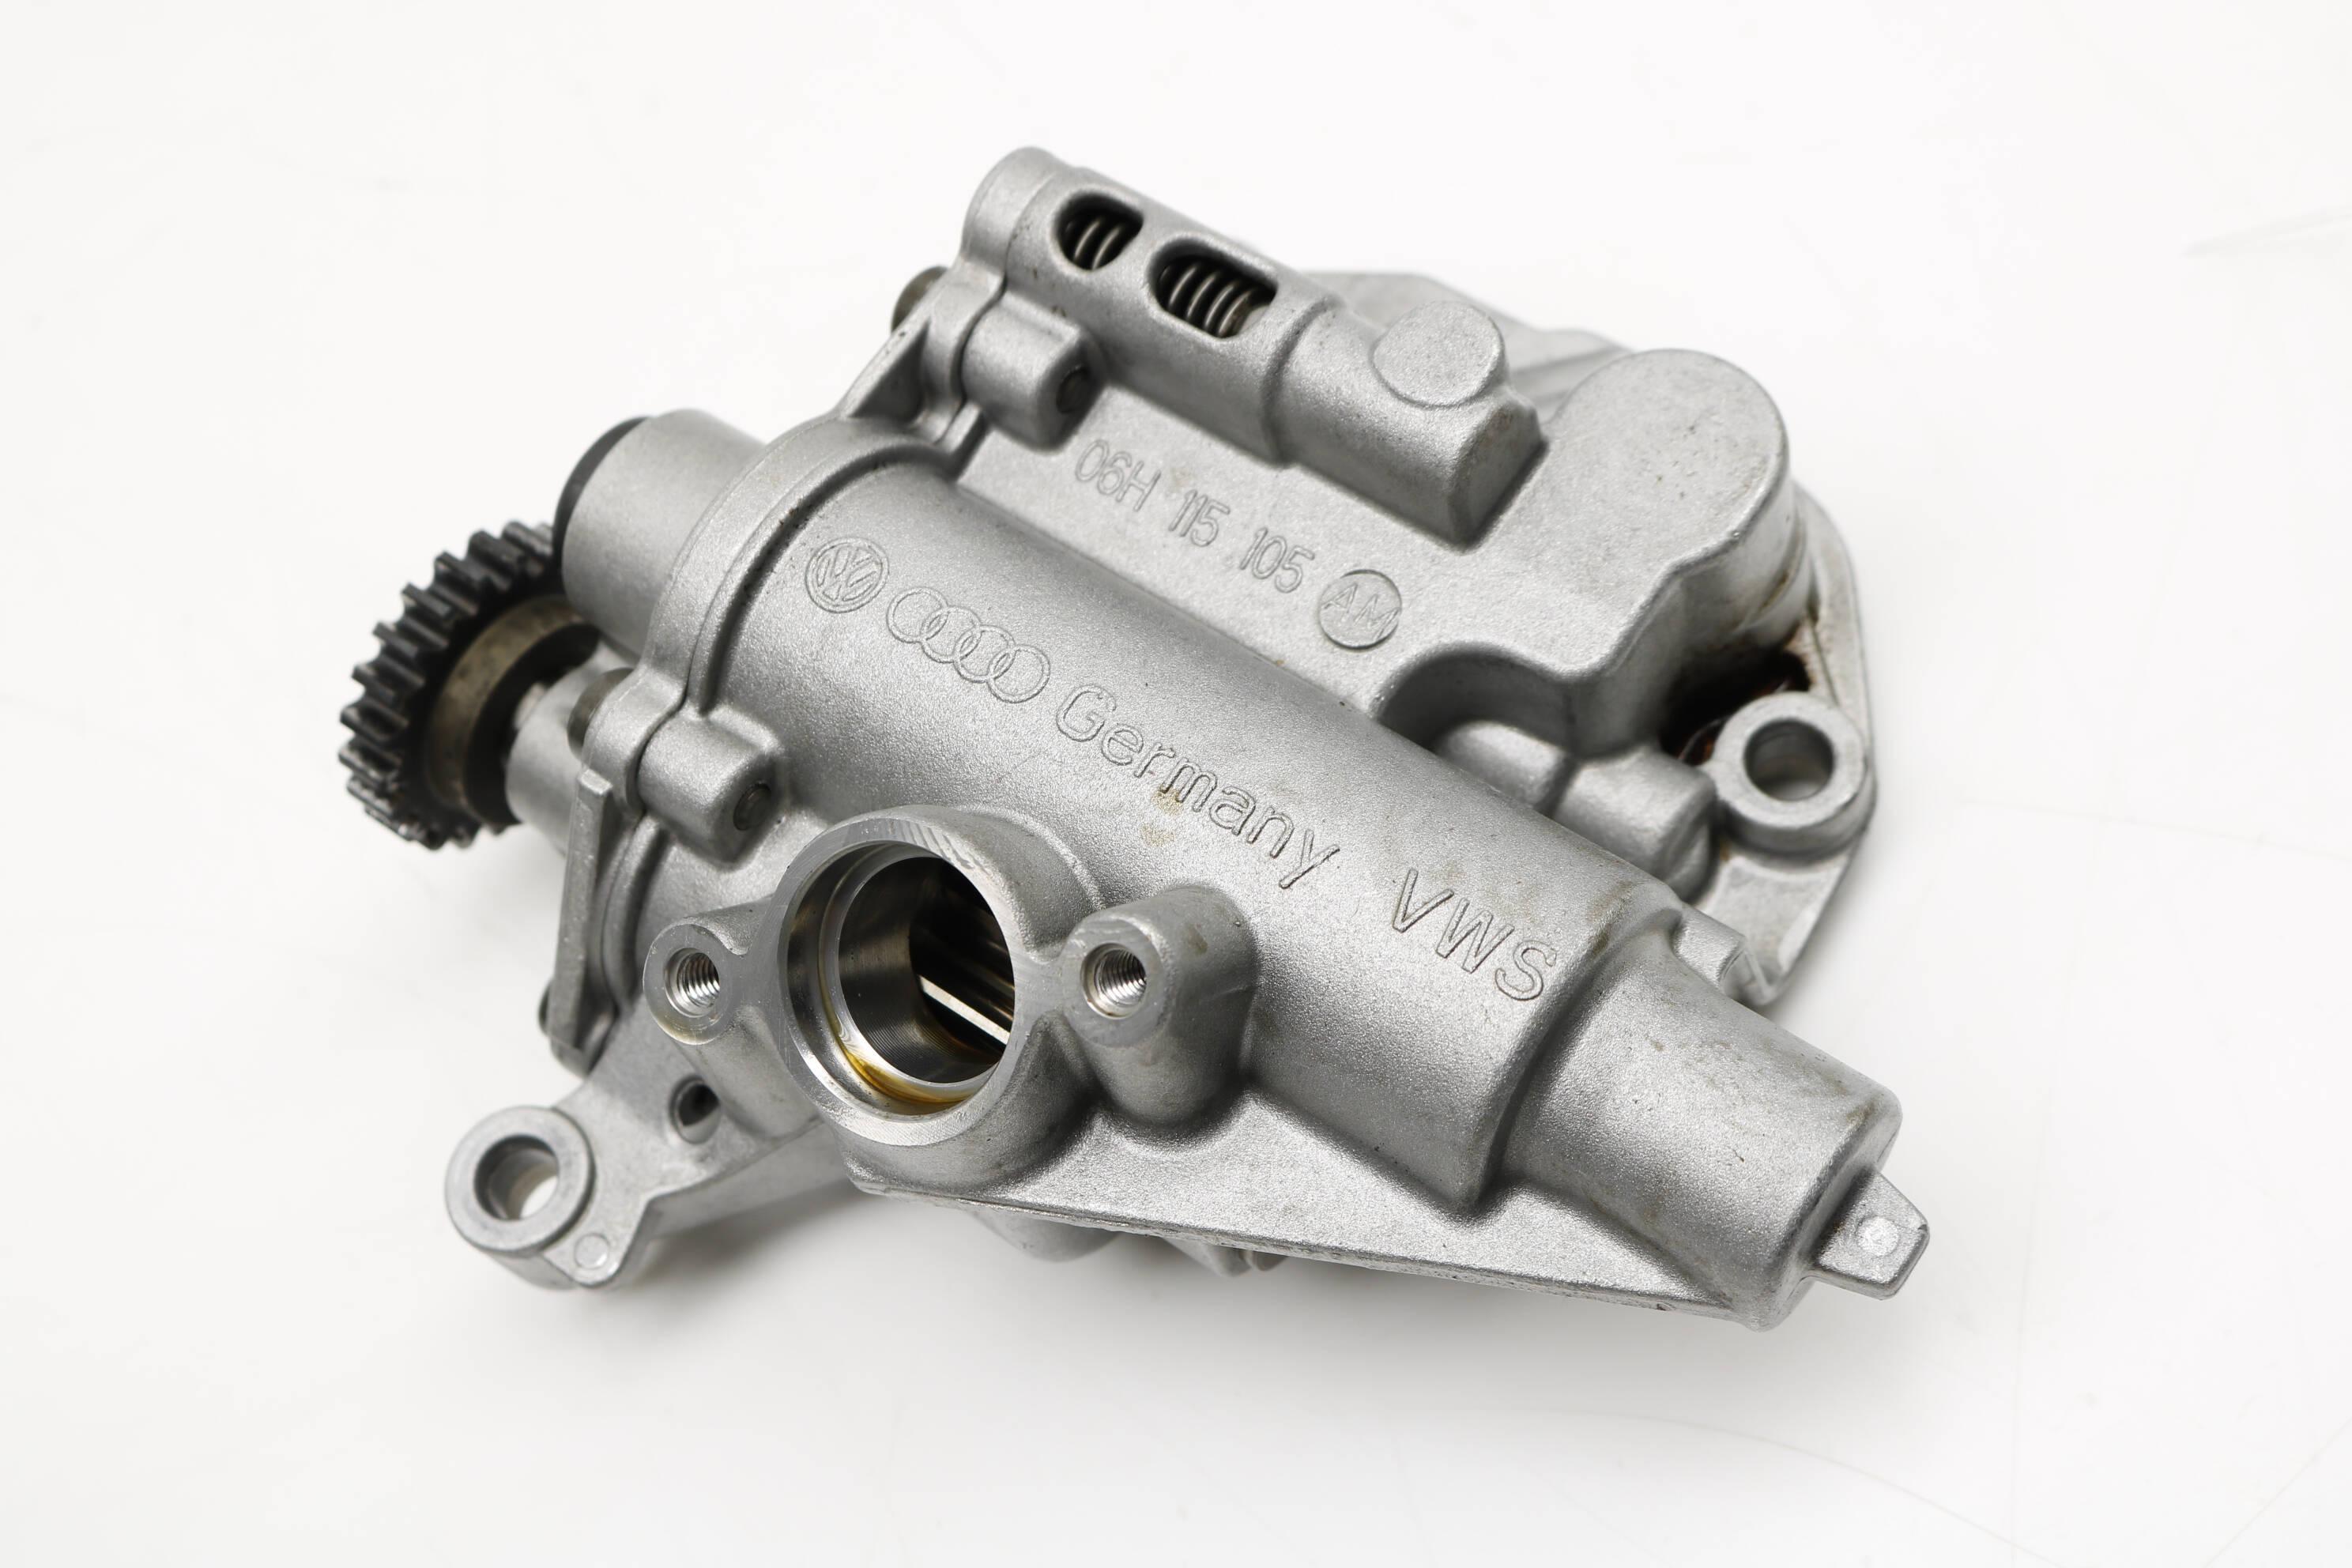 2010 2011 2012 2013 2014 2015 2016 Audi Q5 8r Engine Oil Pump Ebay